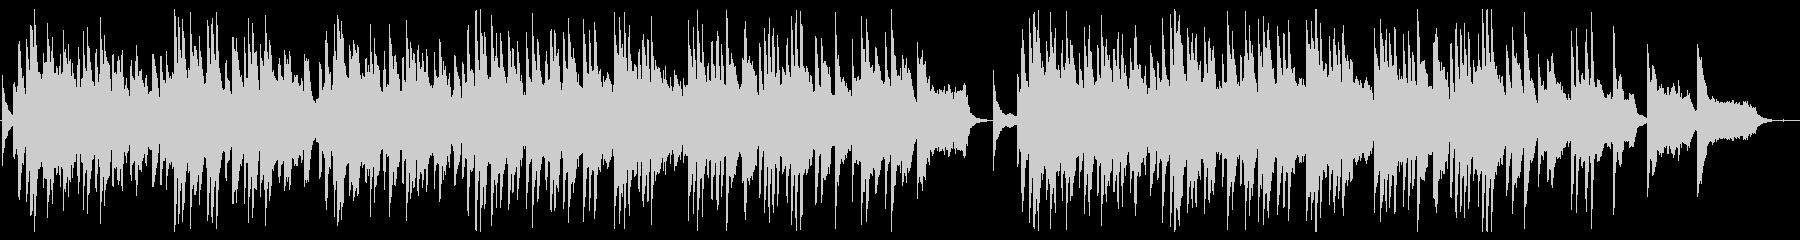 Sad and sad piano slowball's unreproduced waveform